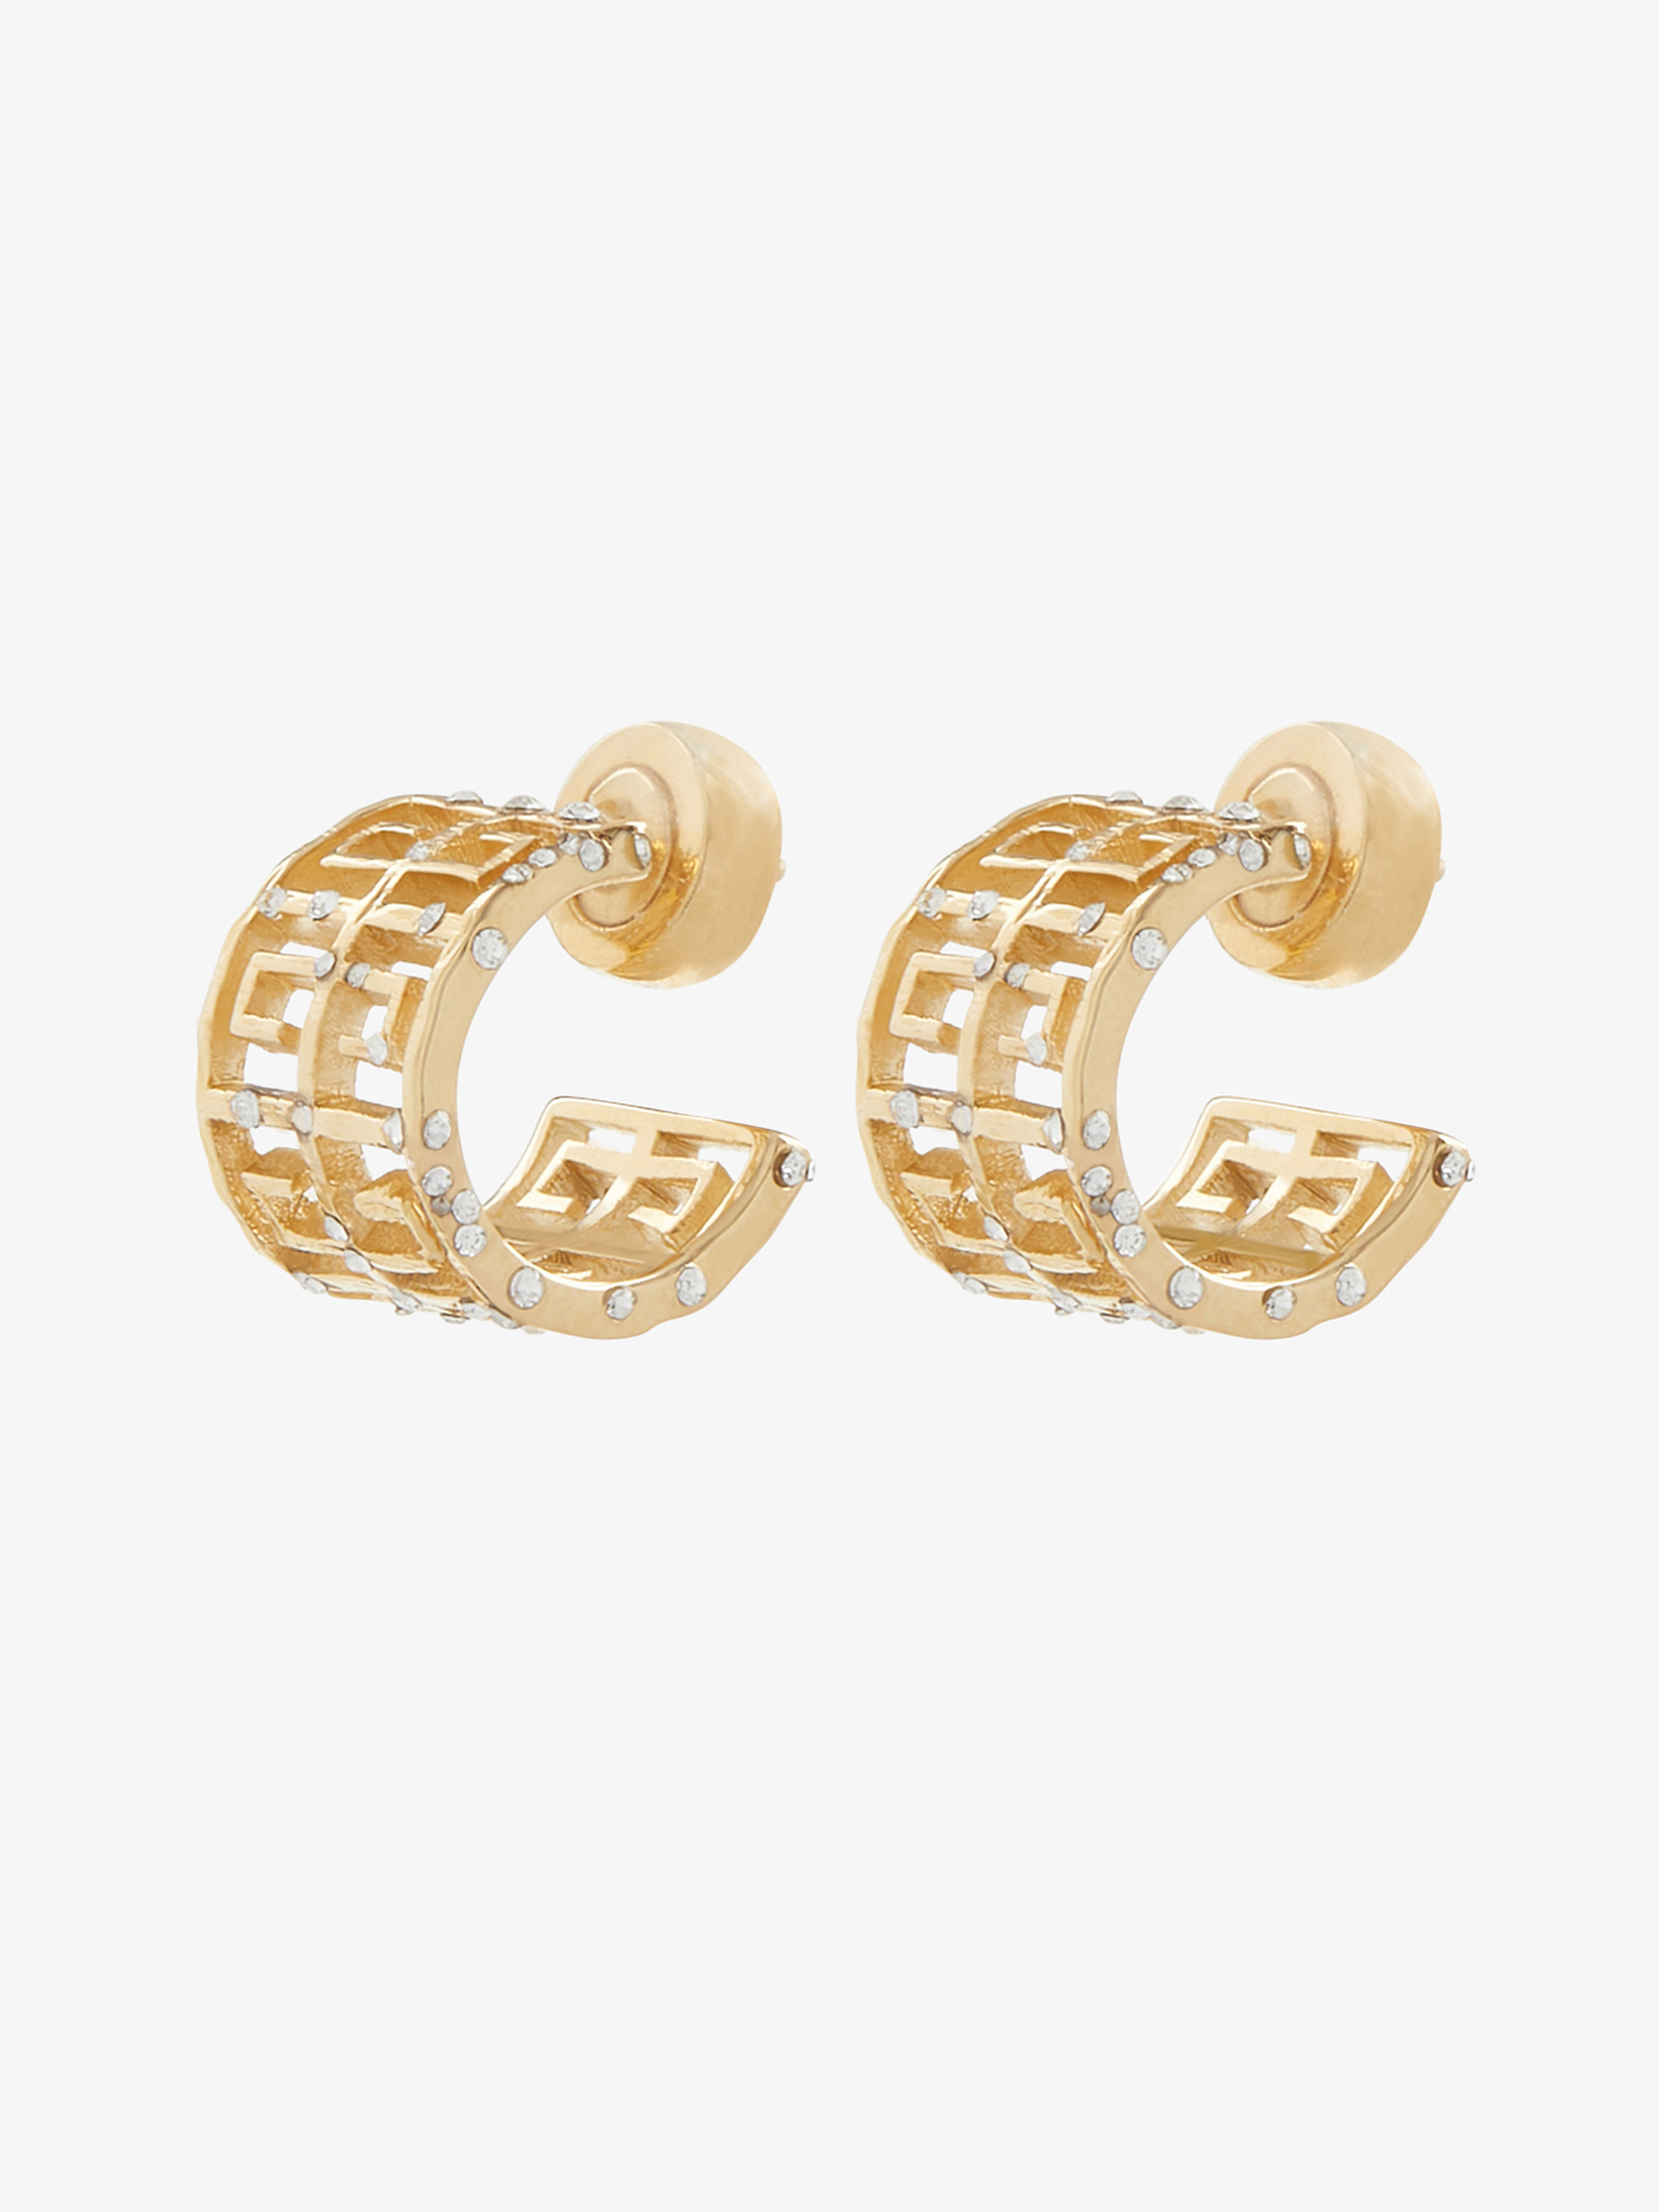 Crystals tiled 4 G earrings